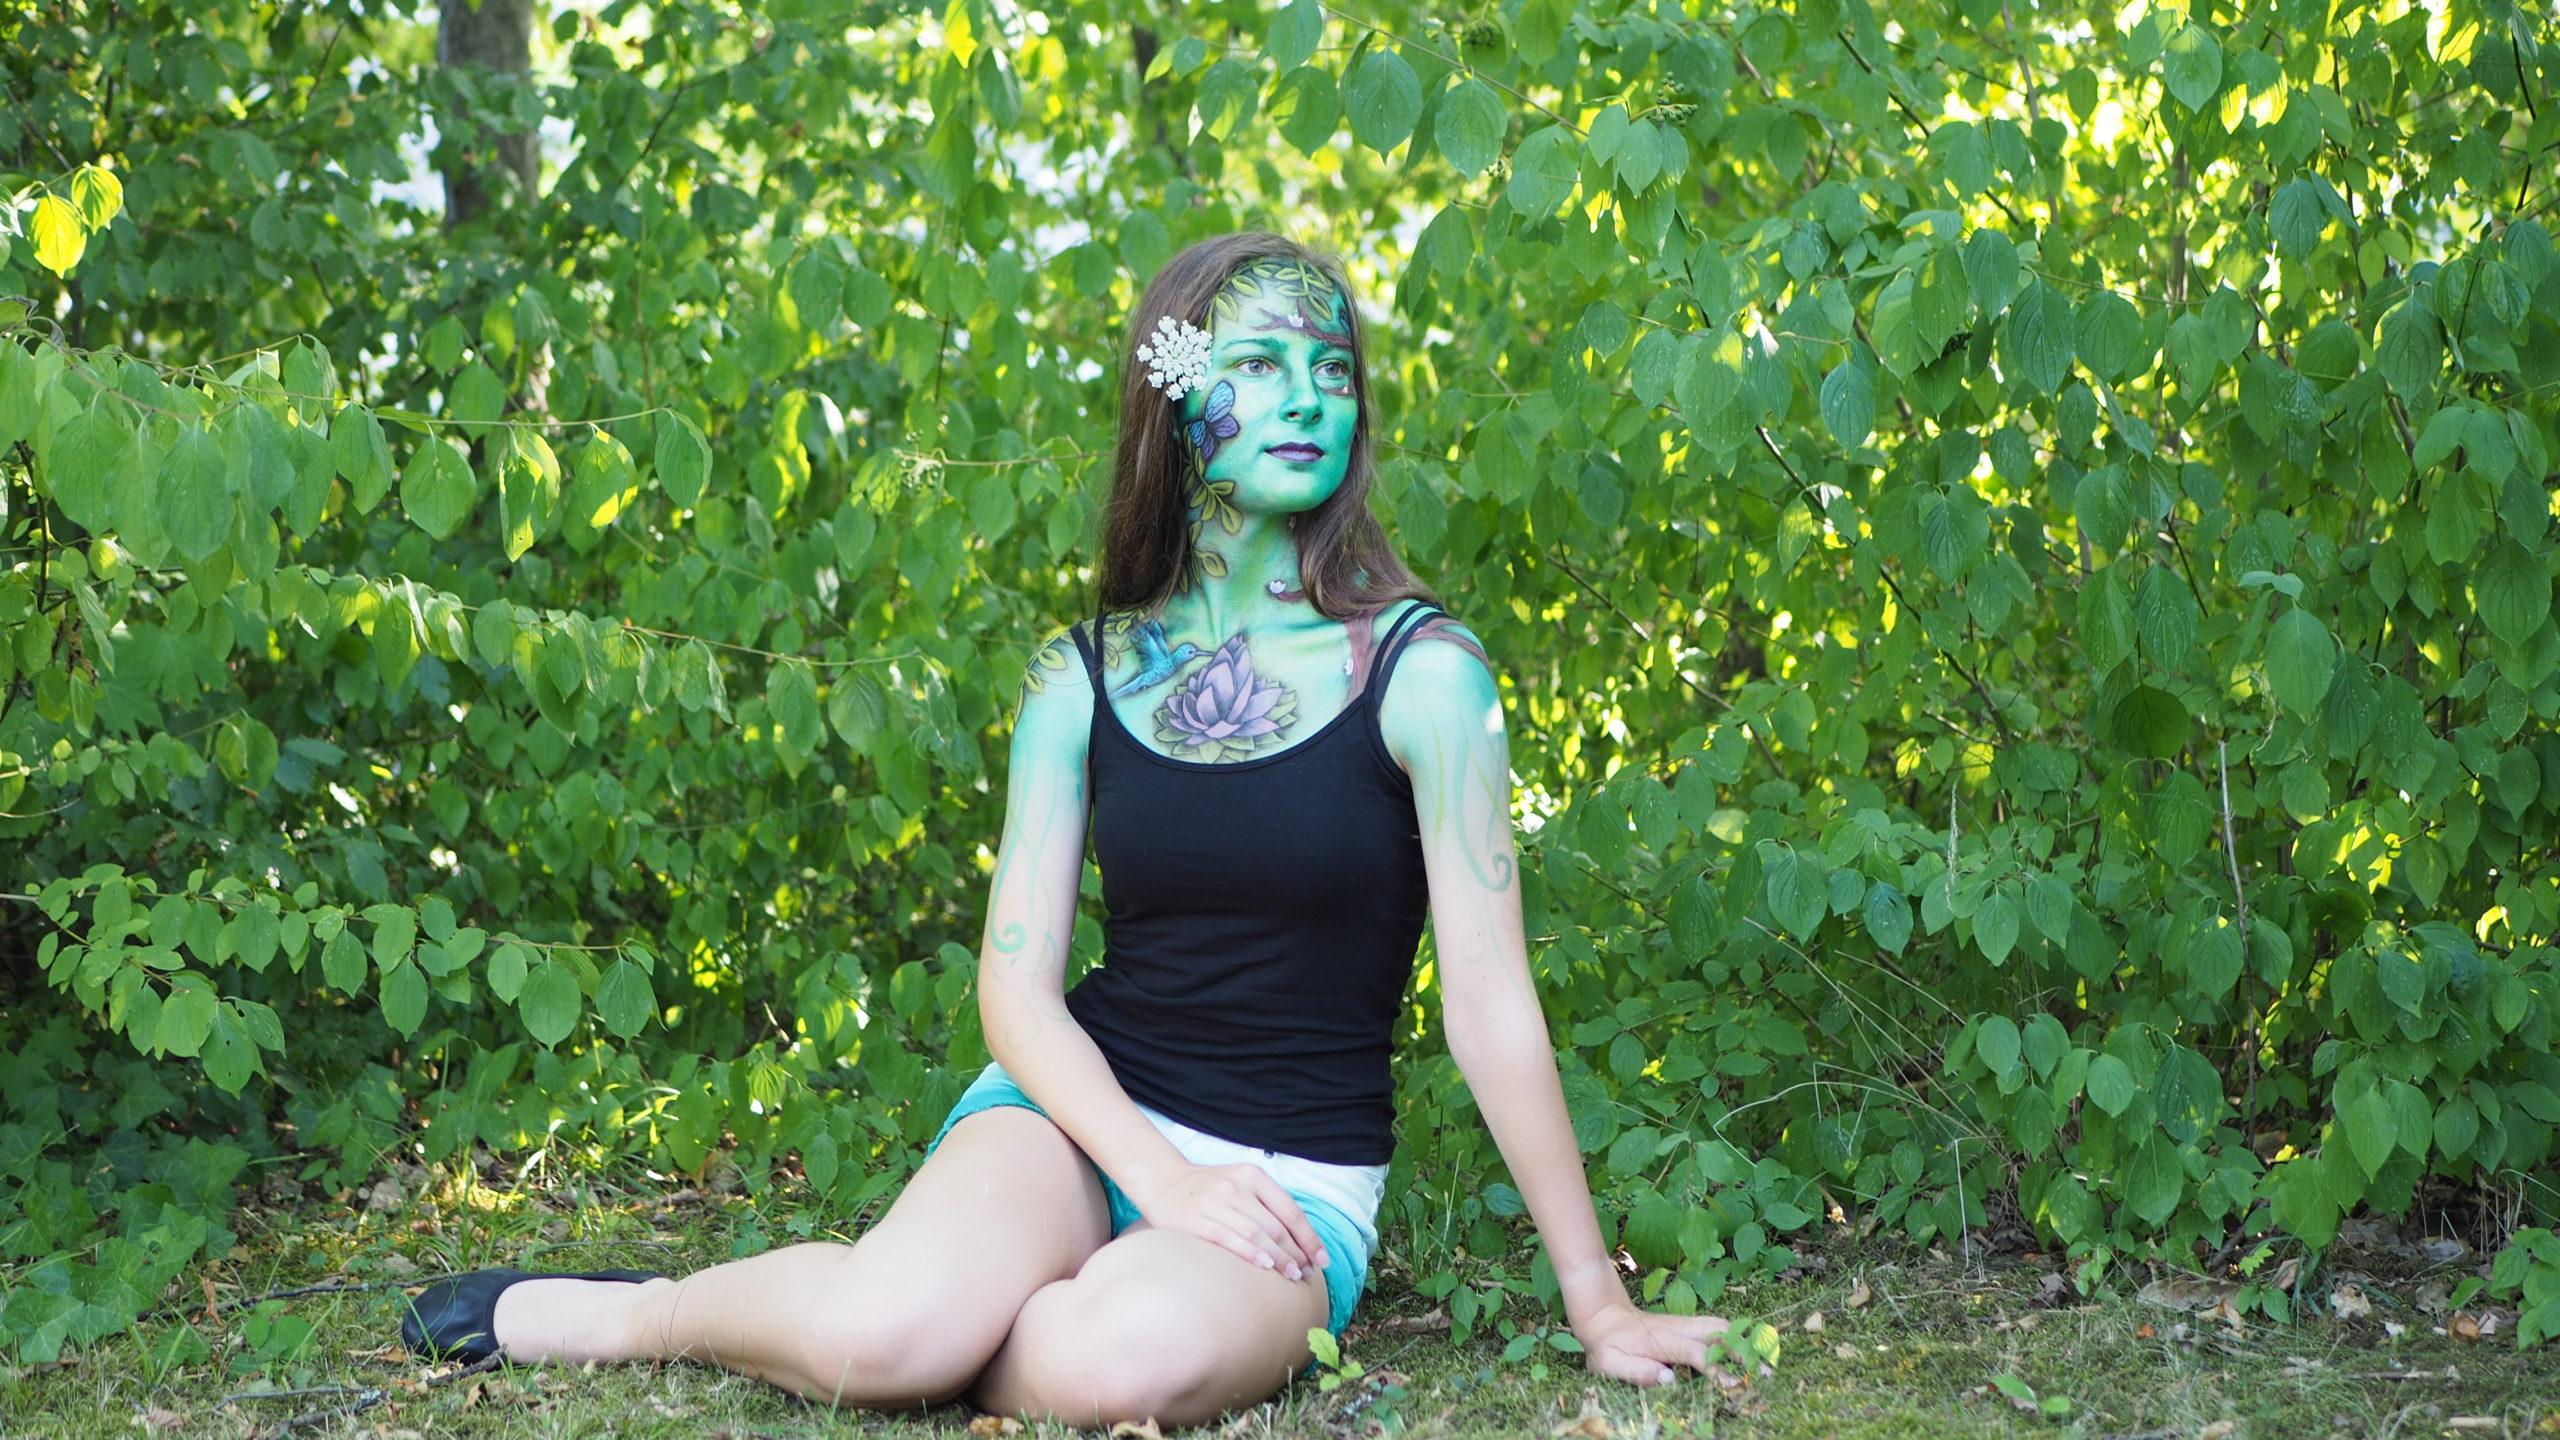 Pflanzenfrau